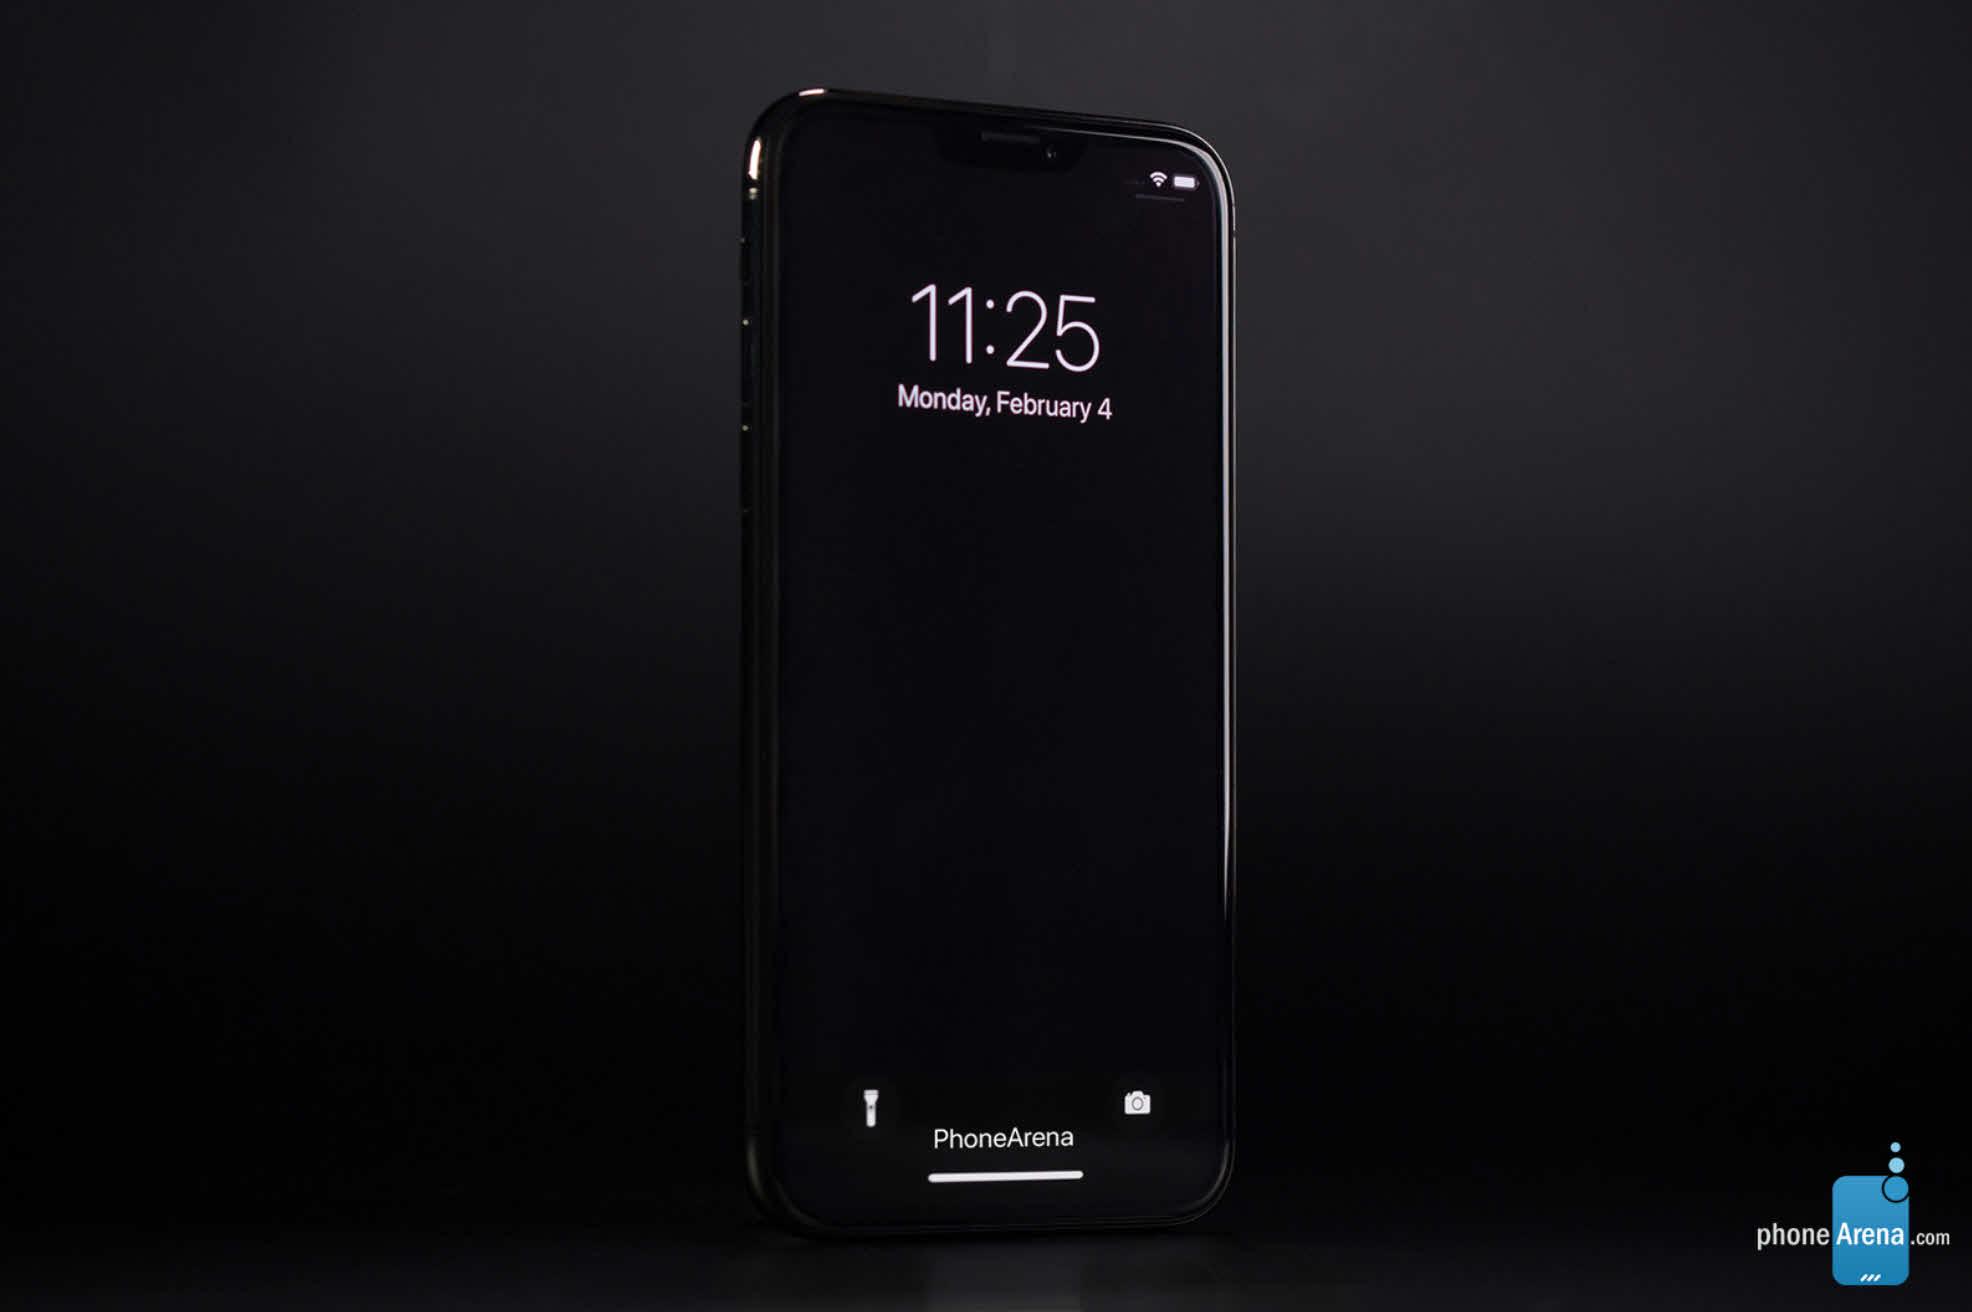 Phonearena Iphone Xi Ios 13 Darkmode Render Img 1 3